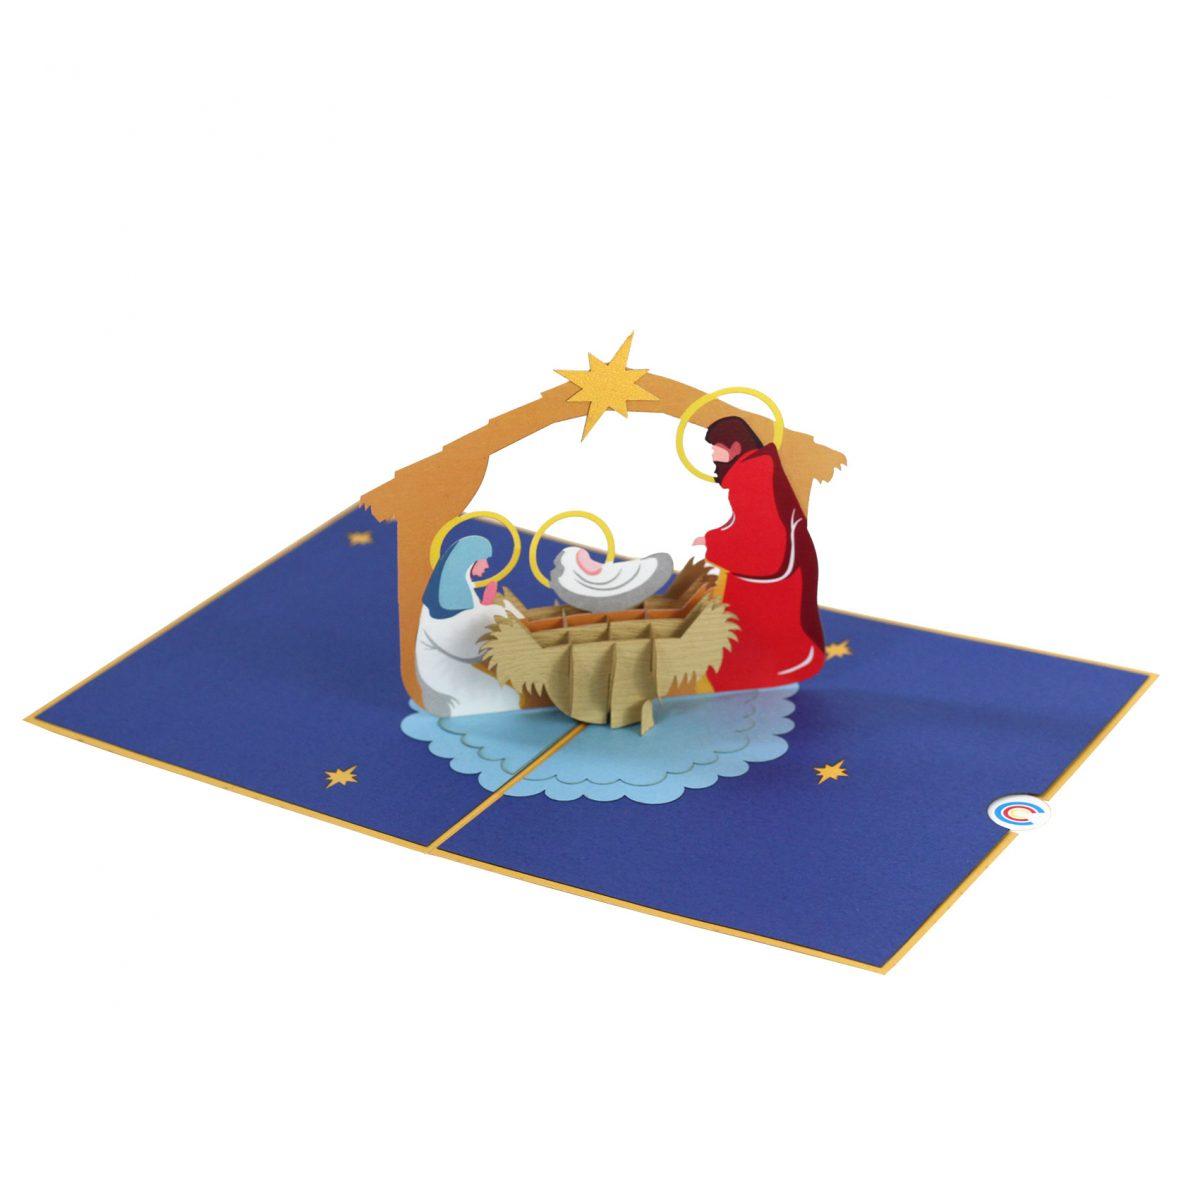 Birth of Jesus Pop Up Christmas Card